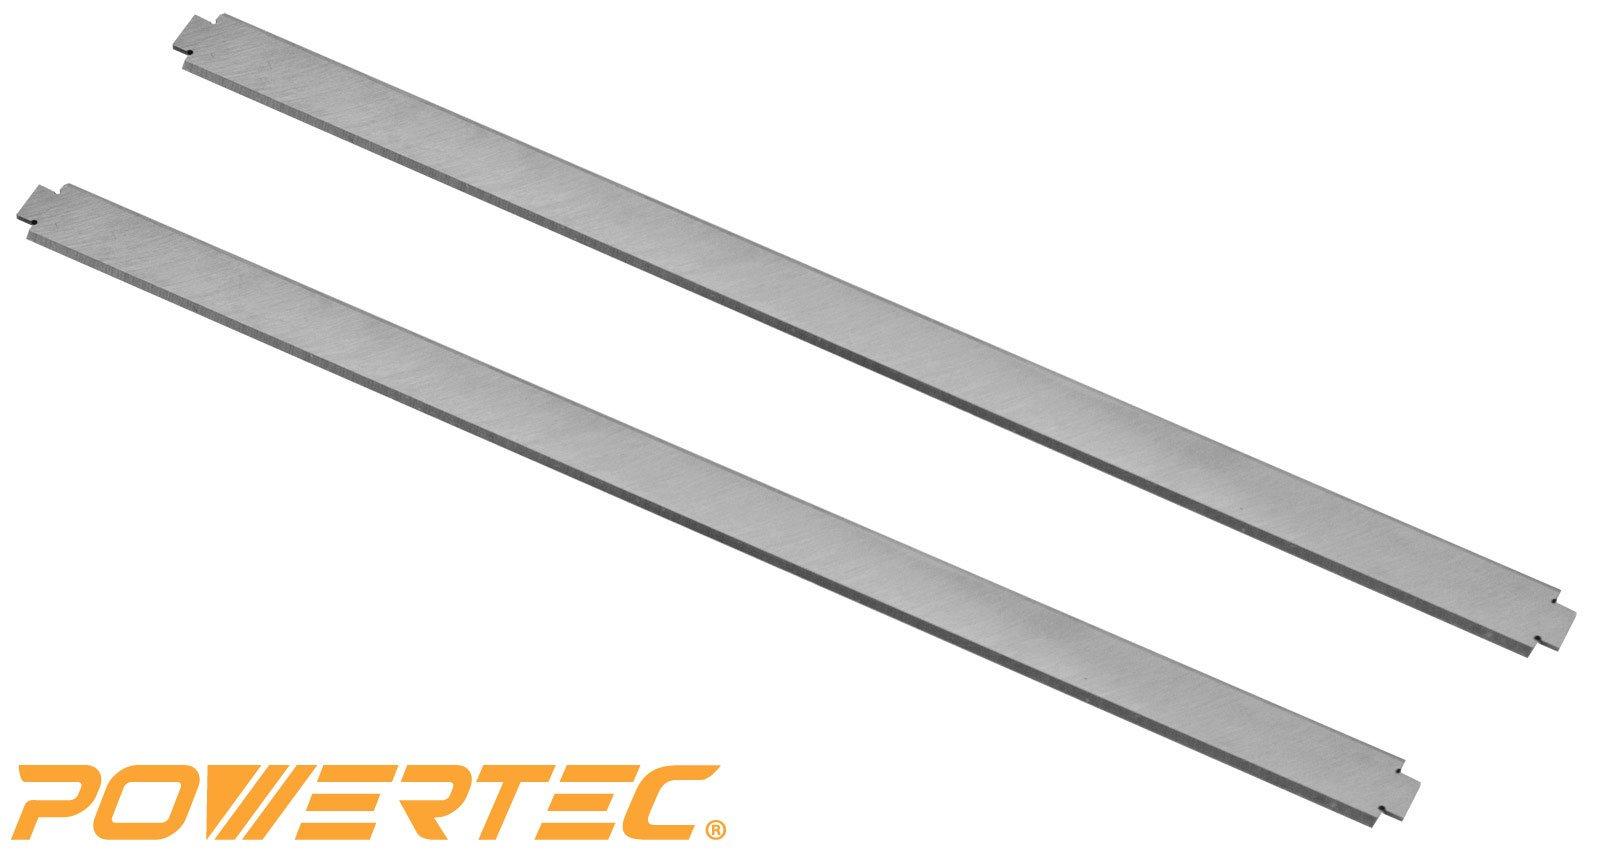 POWERTEC HSS Planer Blades for Ryobi 13'' Planer AP1301, Set of 2